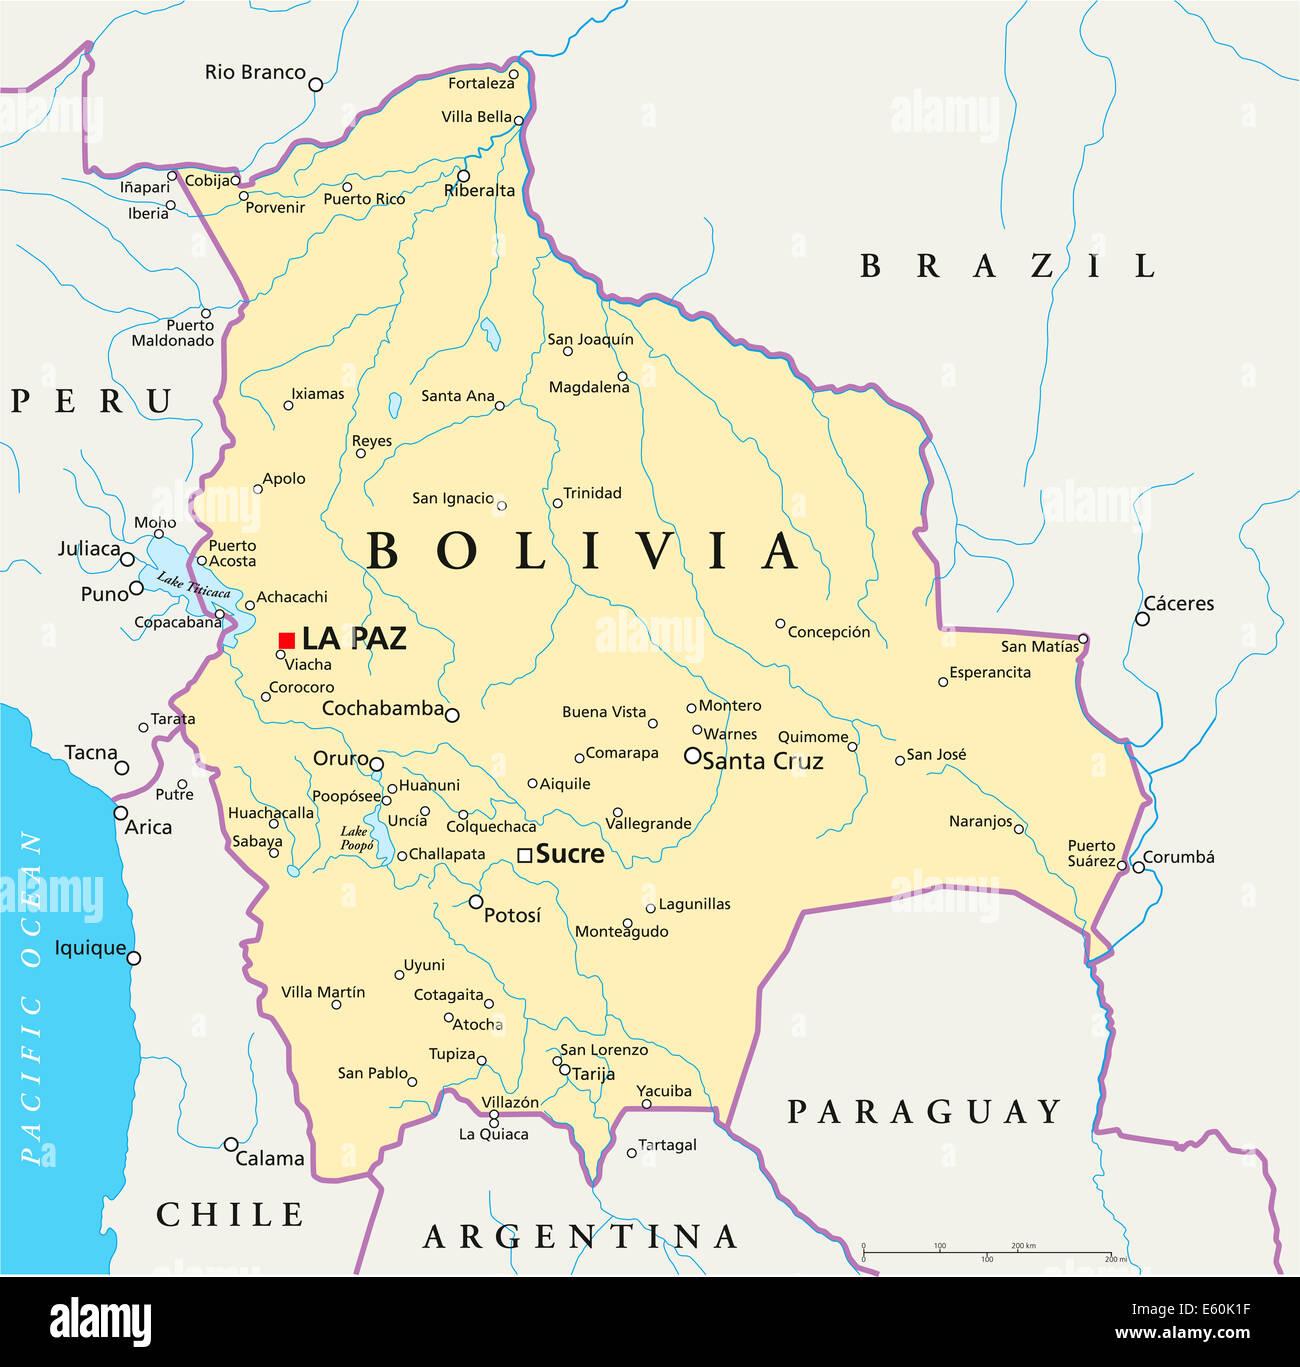 Bolivia Political Map Stock Photo 72544347 Alamy